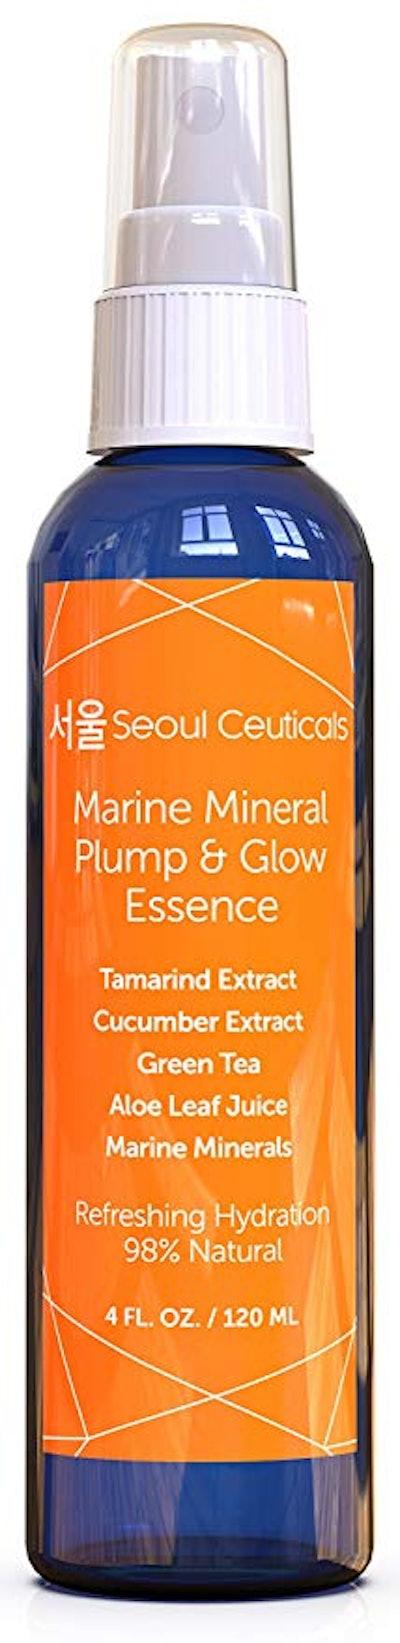 SeoulCeuticals Essence Korean Skin Care